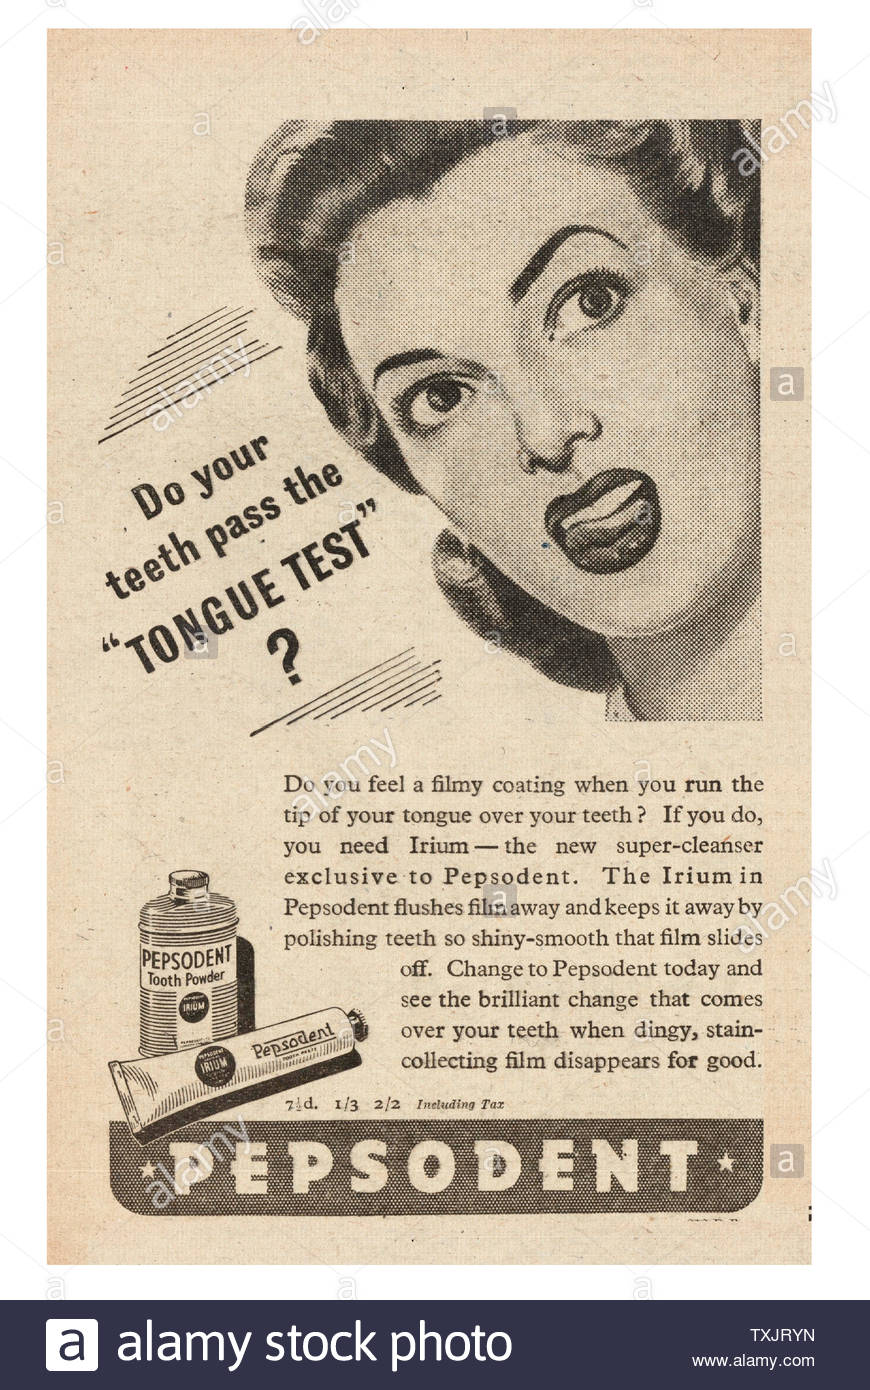 Dental Hygiene Ad Stock Photos & Dental Hygiene Ad Stock Images ...